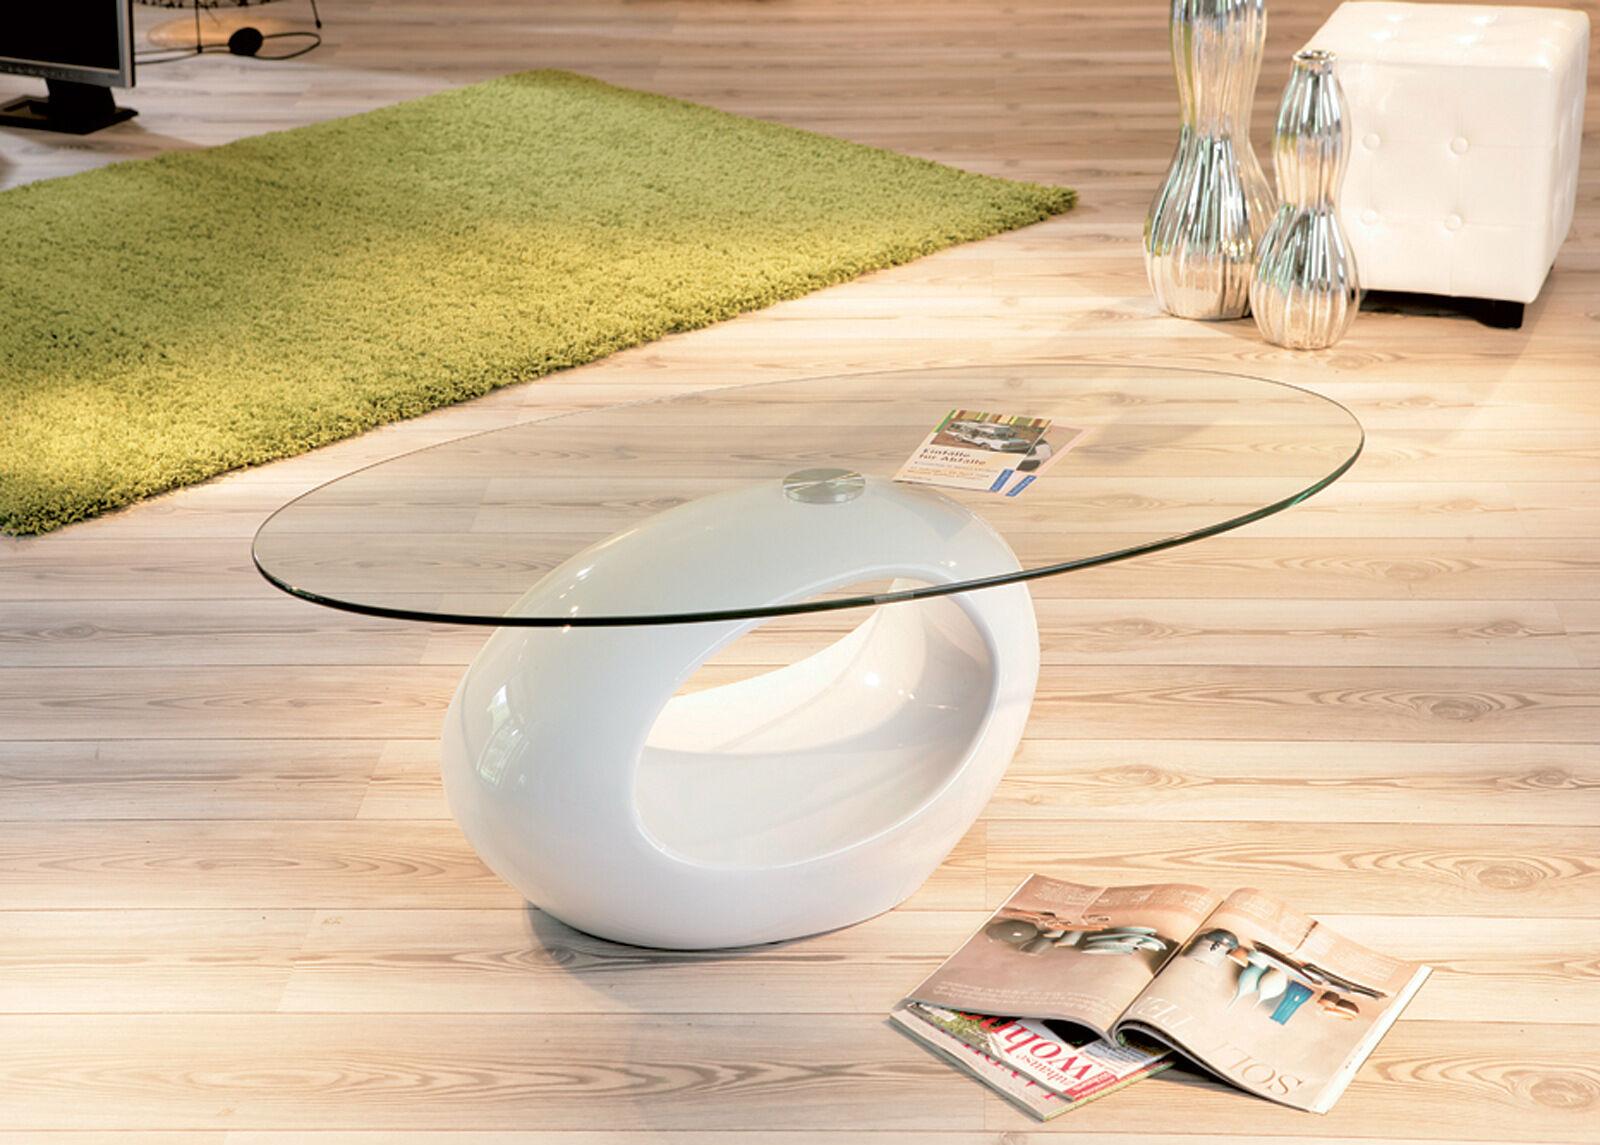 InterLink Sohvapöytä 60x110 cm